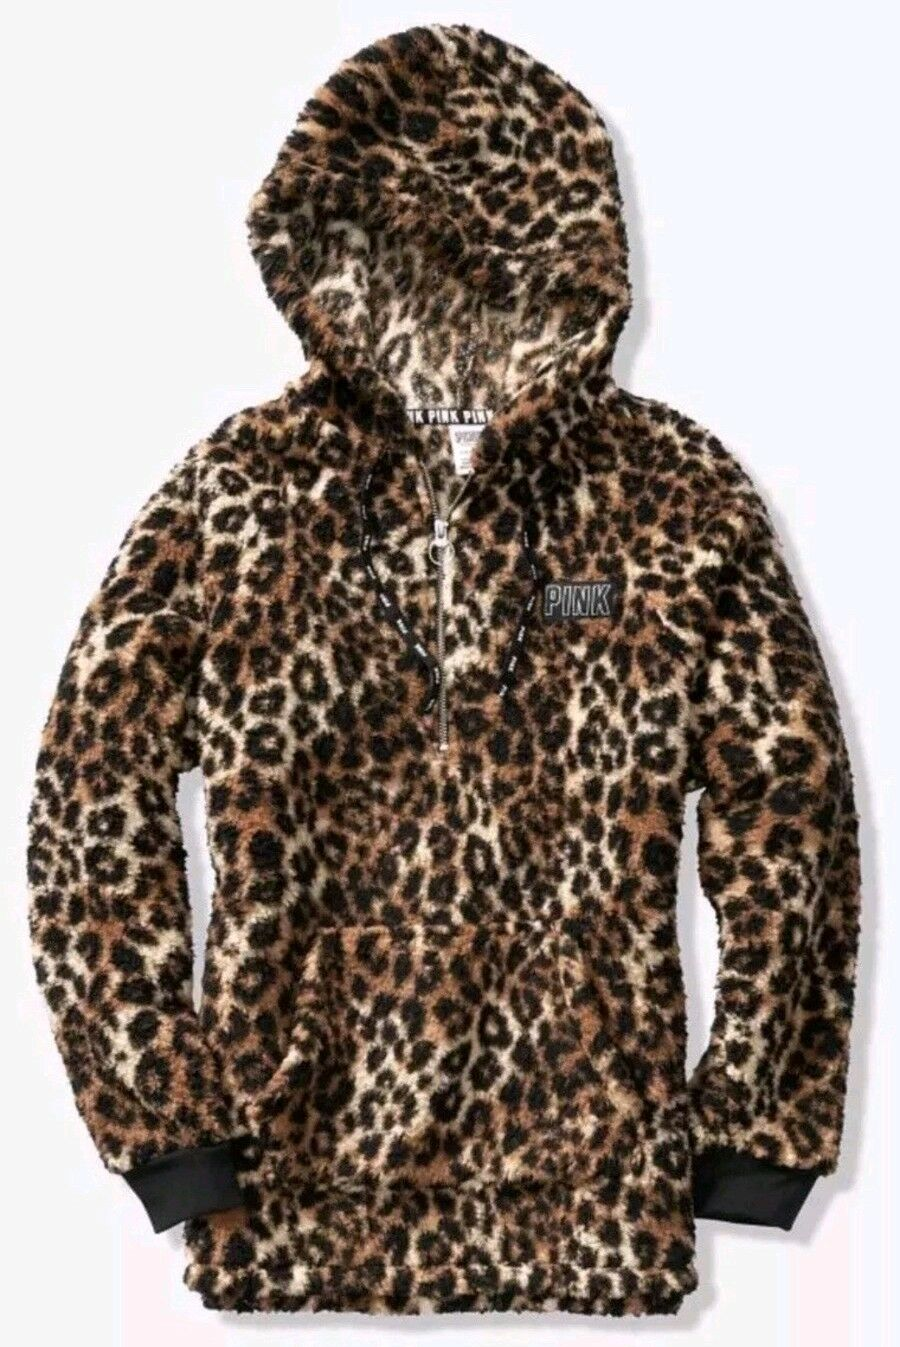 NWT Victoria's Secret PINK Cozy Sherpa Quarter Zip Hoodie Leopard M MEDIUM